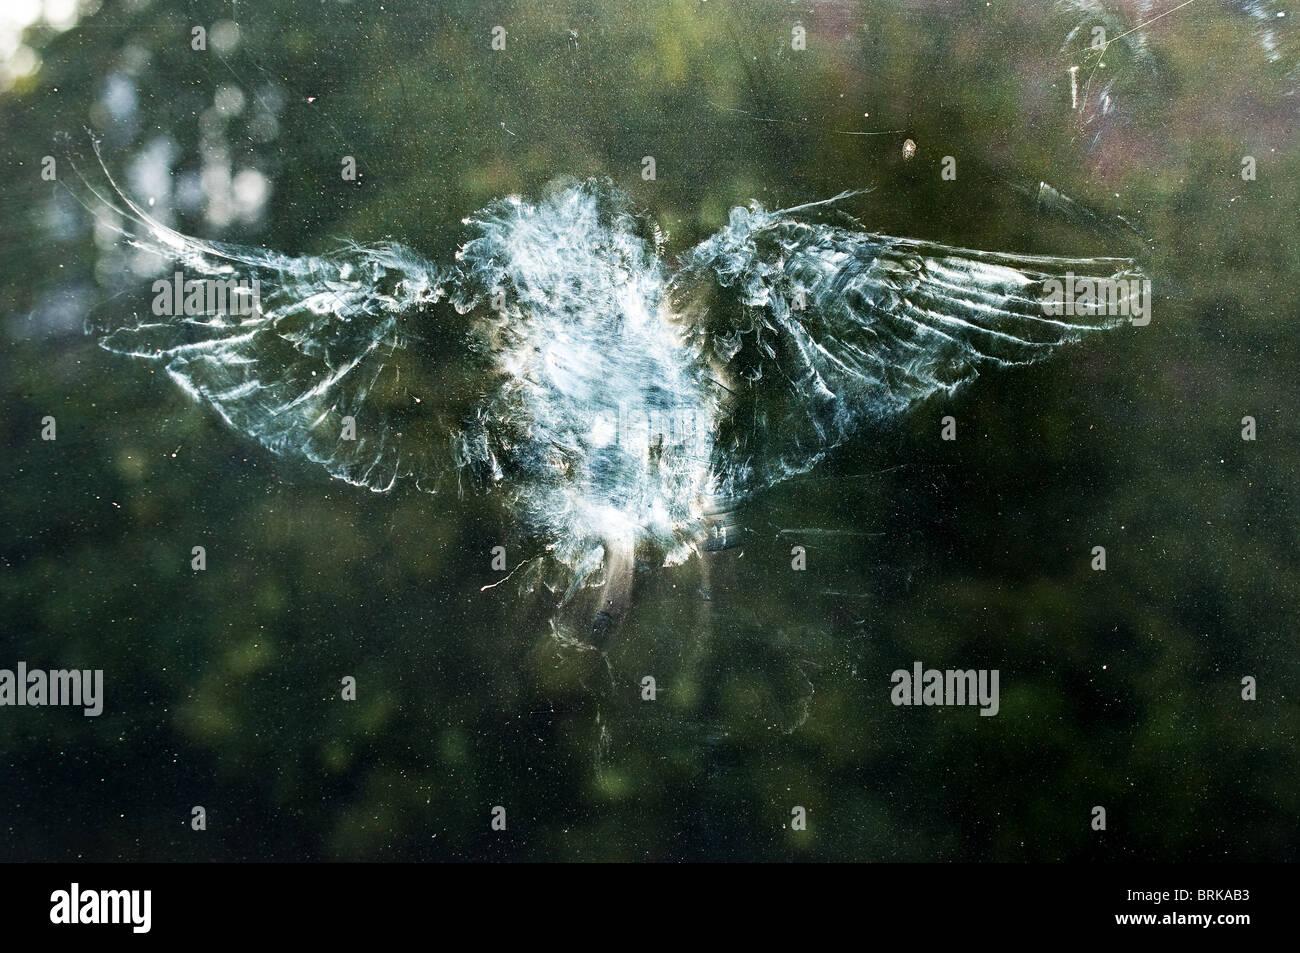 The mark of a bird having flown into a window. - Stock Image